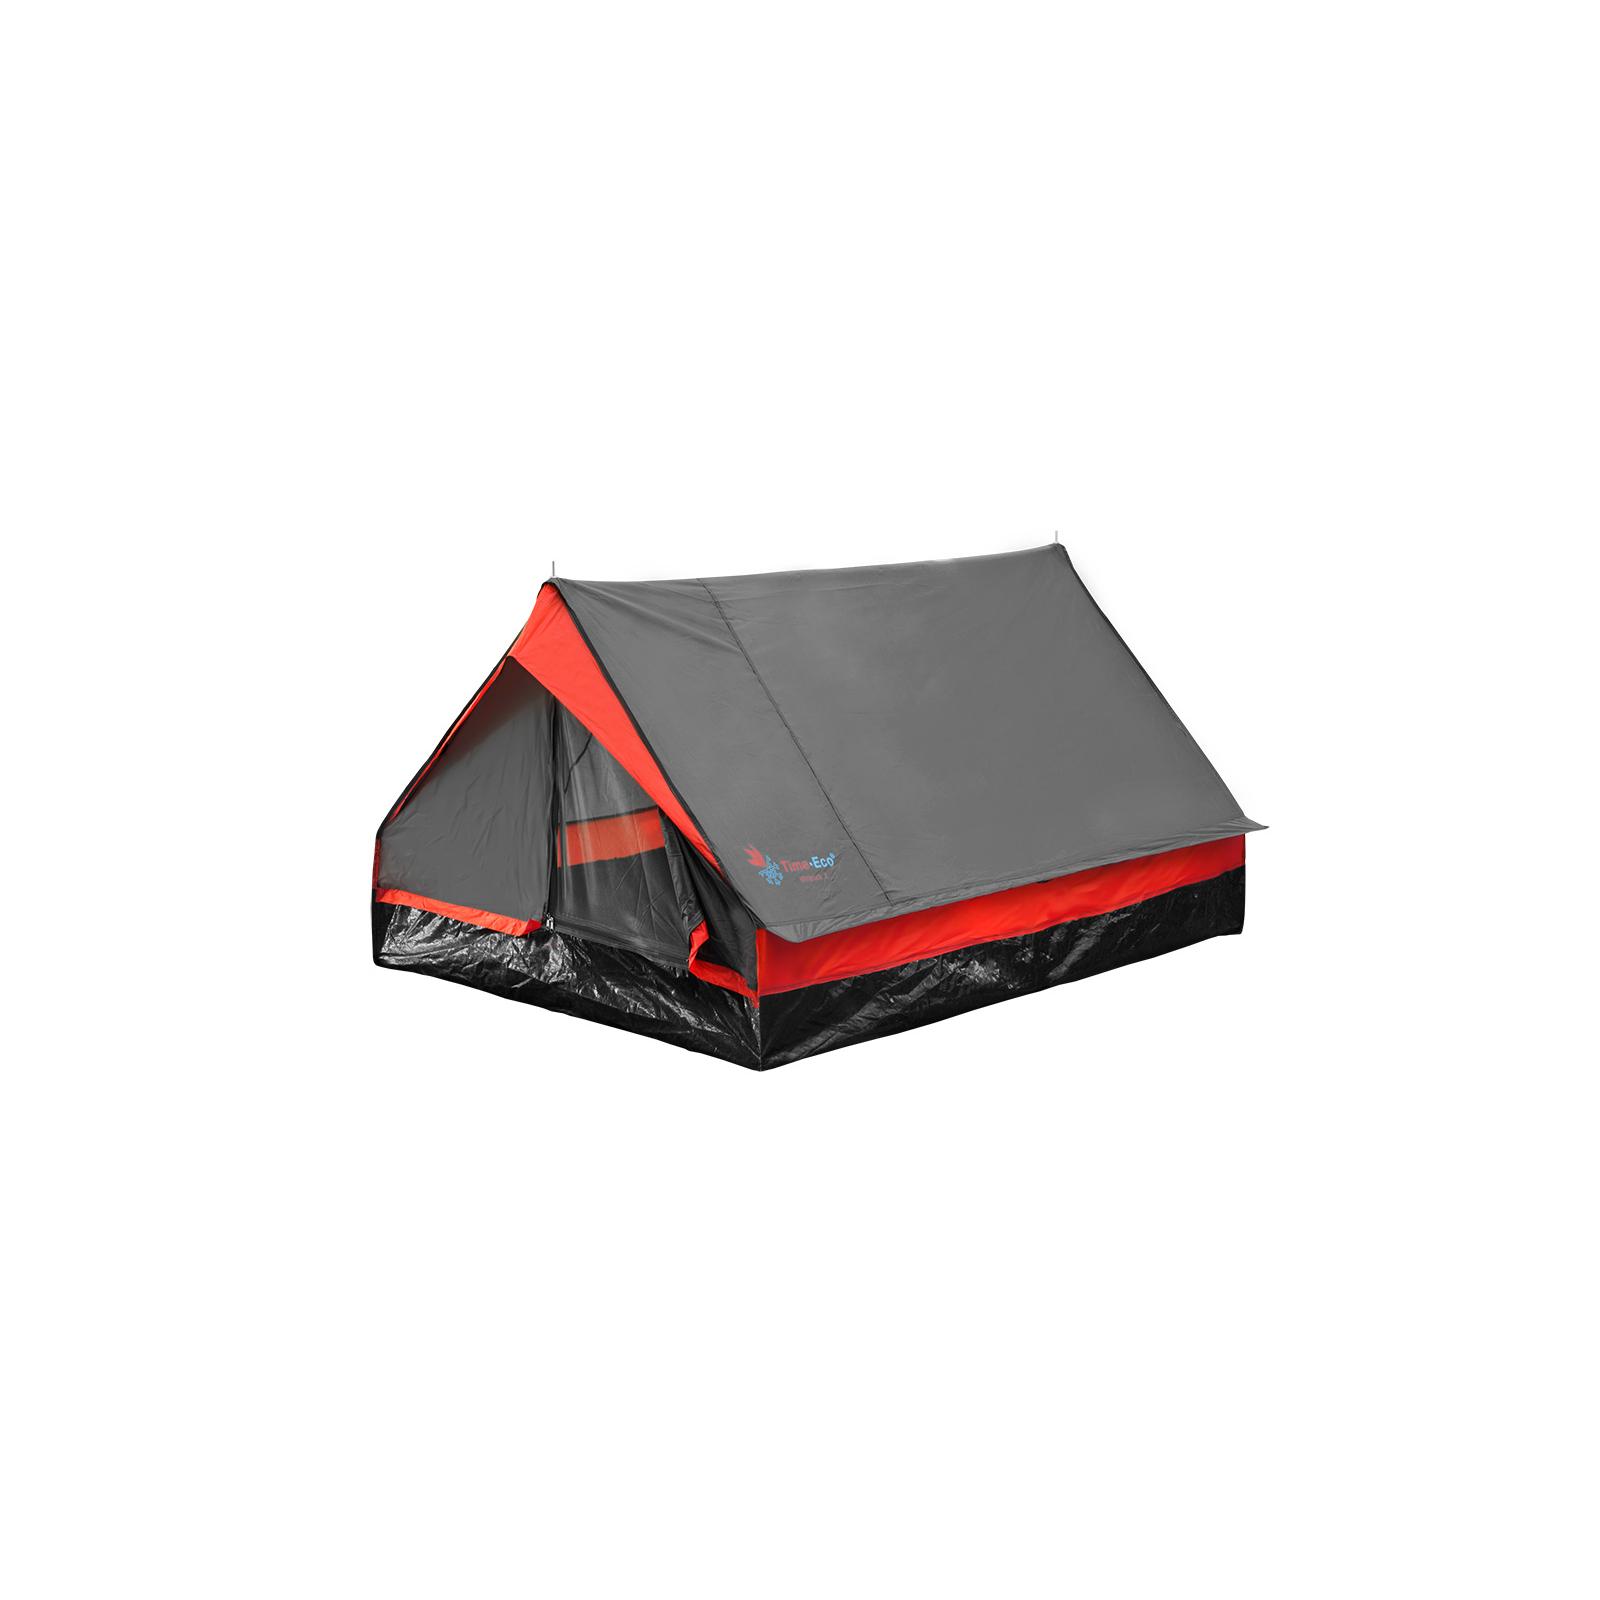 Палатка Time Eco Minipack-2 изображение 2